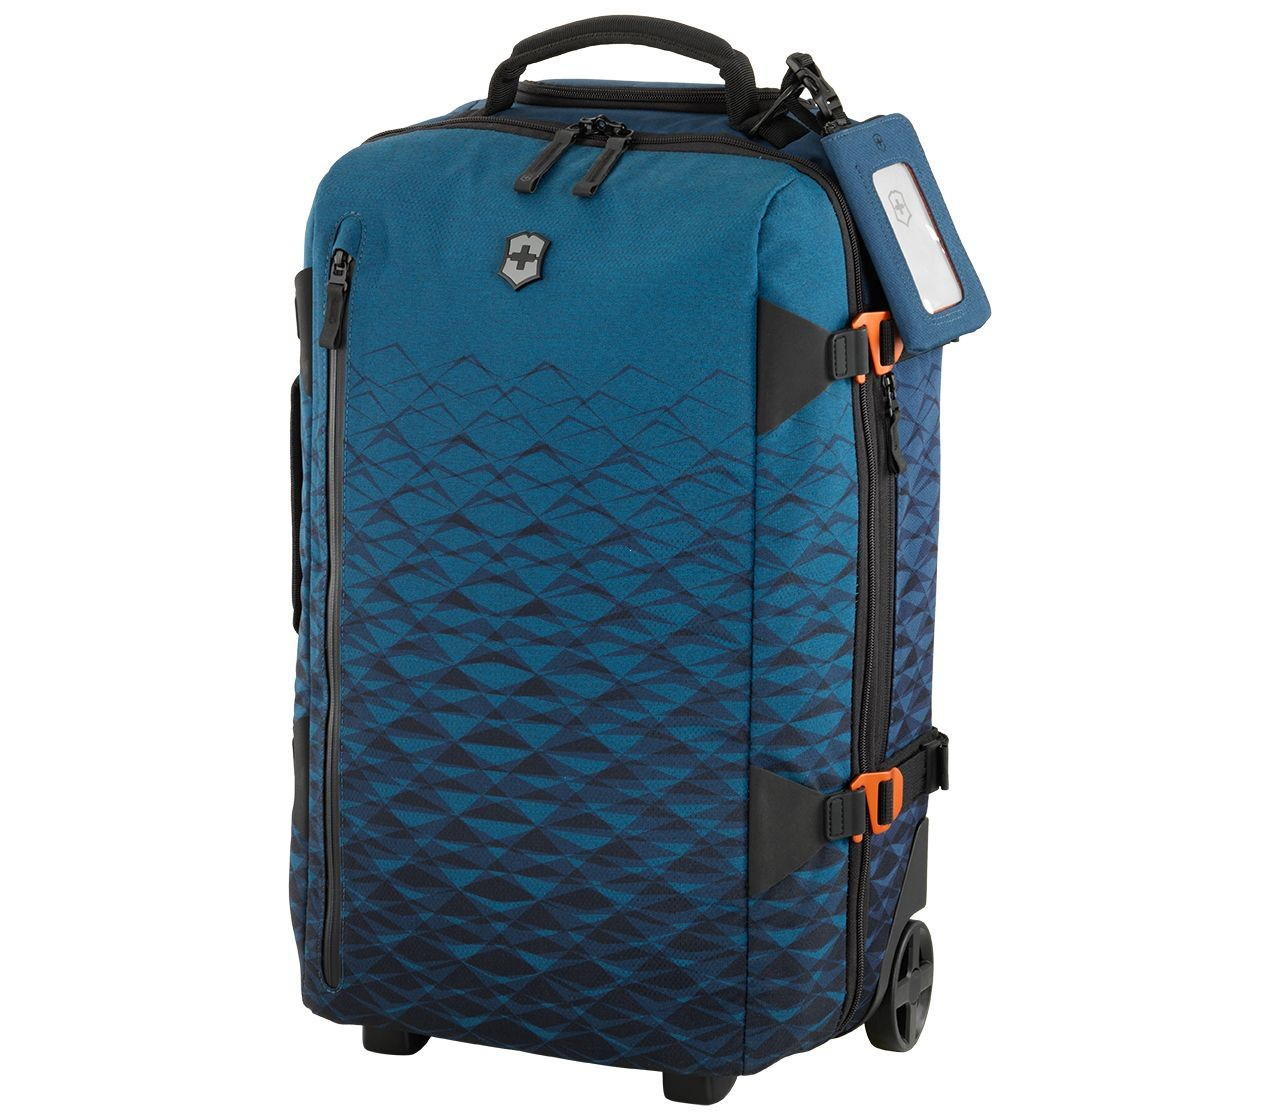 e04037e591979 Torba/Walizka podróżna kabinowa, 33 litry, 2 kółka, zamek TSA, marki ...